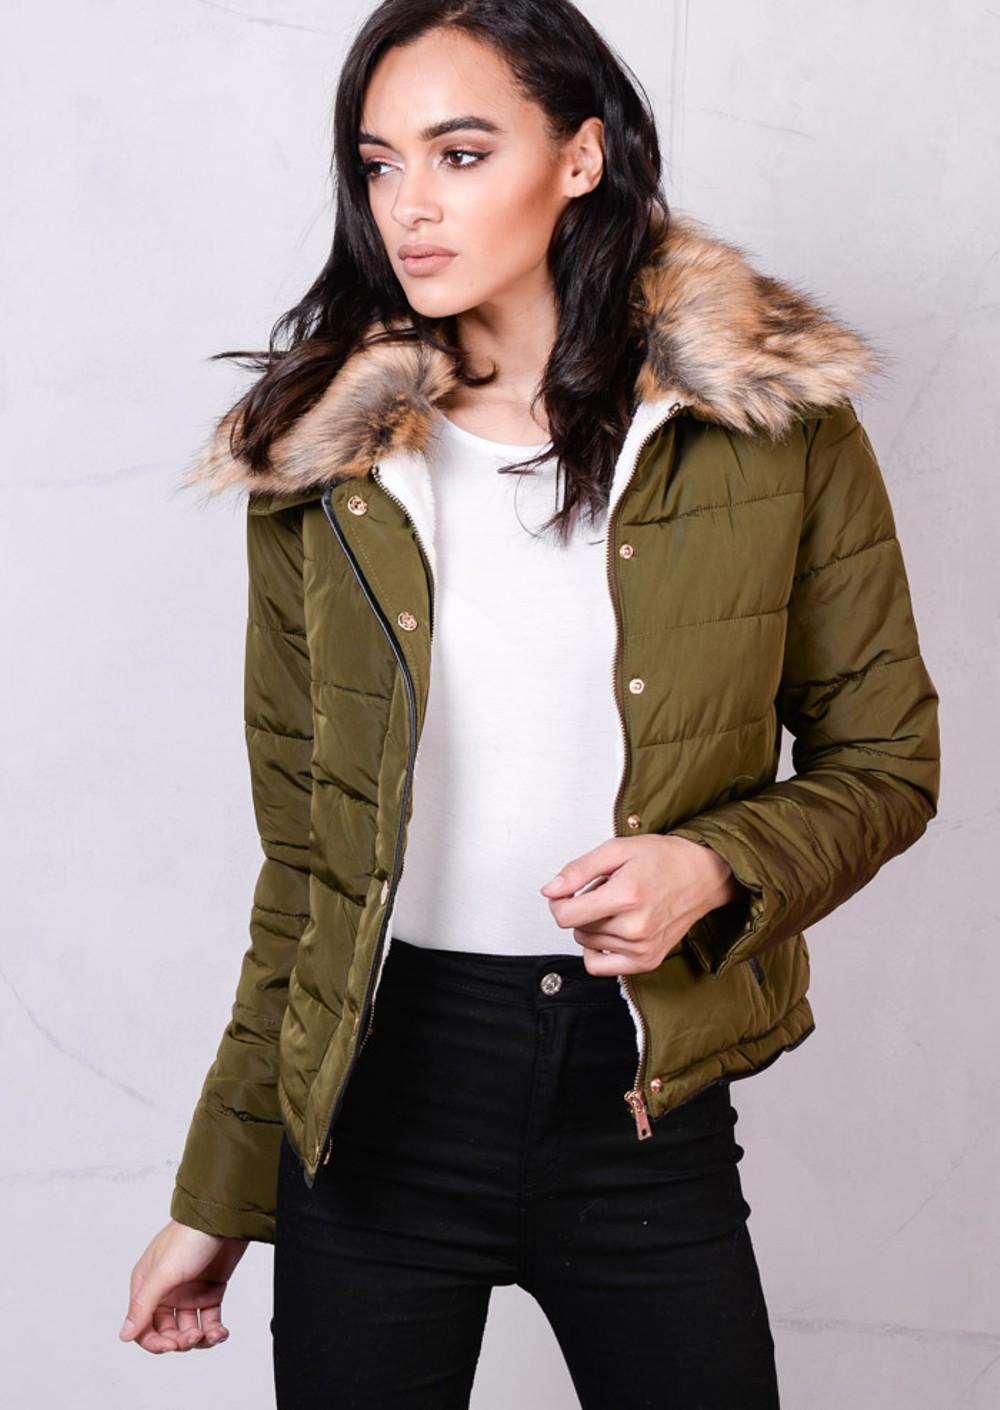 Brown Faux Fur Collar Quilted Fleece Padded Puffer Jacket Coat Khaki Green - Women's Puffer Jackets Puffa Jackets Lily Lulu Fashion